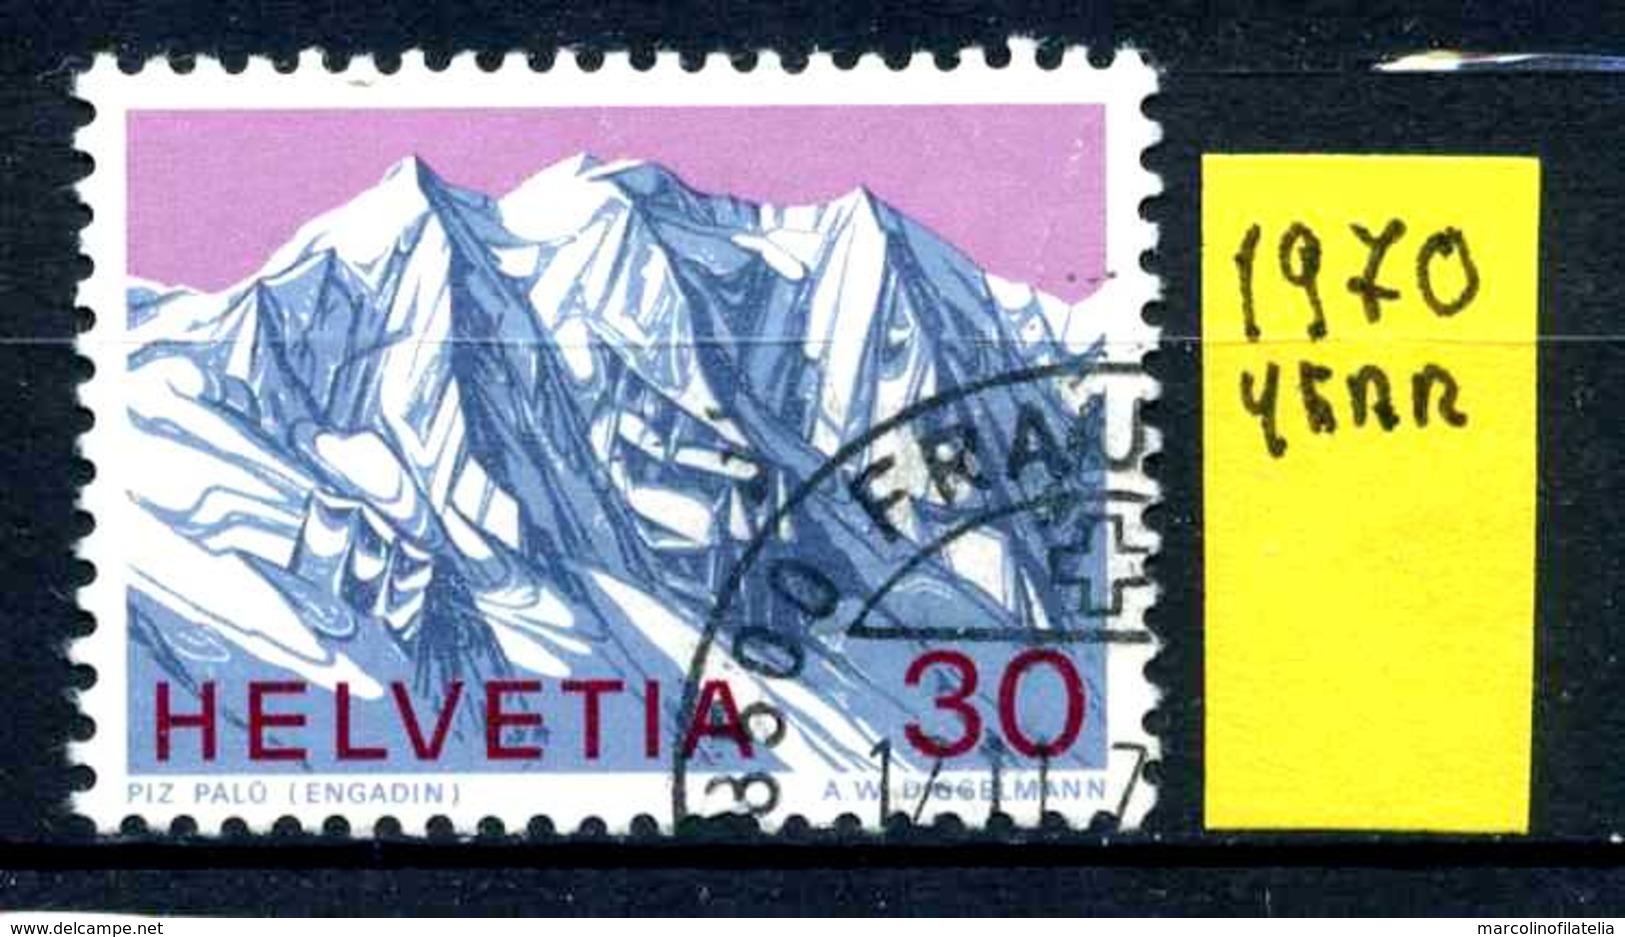 SVIZZERA - HELVETIA - Year 1970 - Usato - Used - Utilisè - Gebraucht.. - Usati